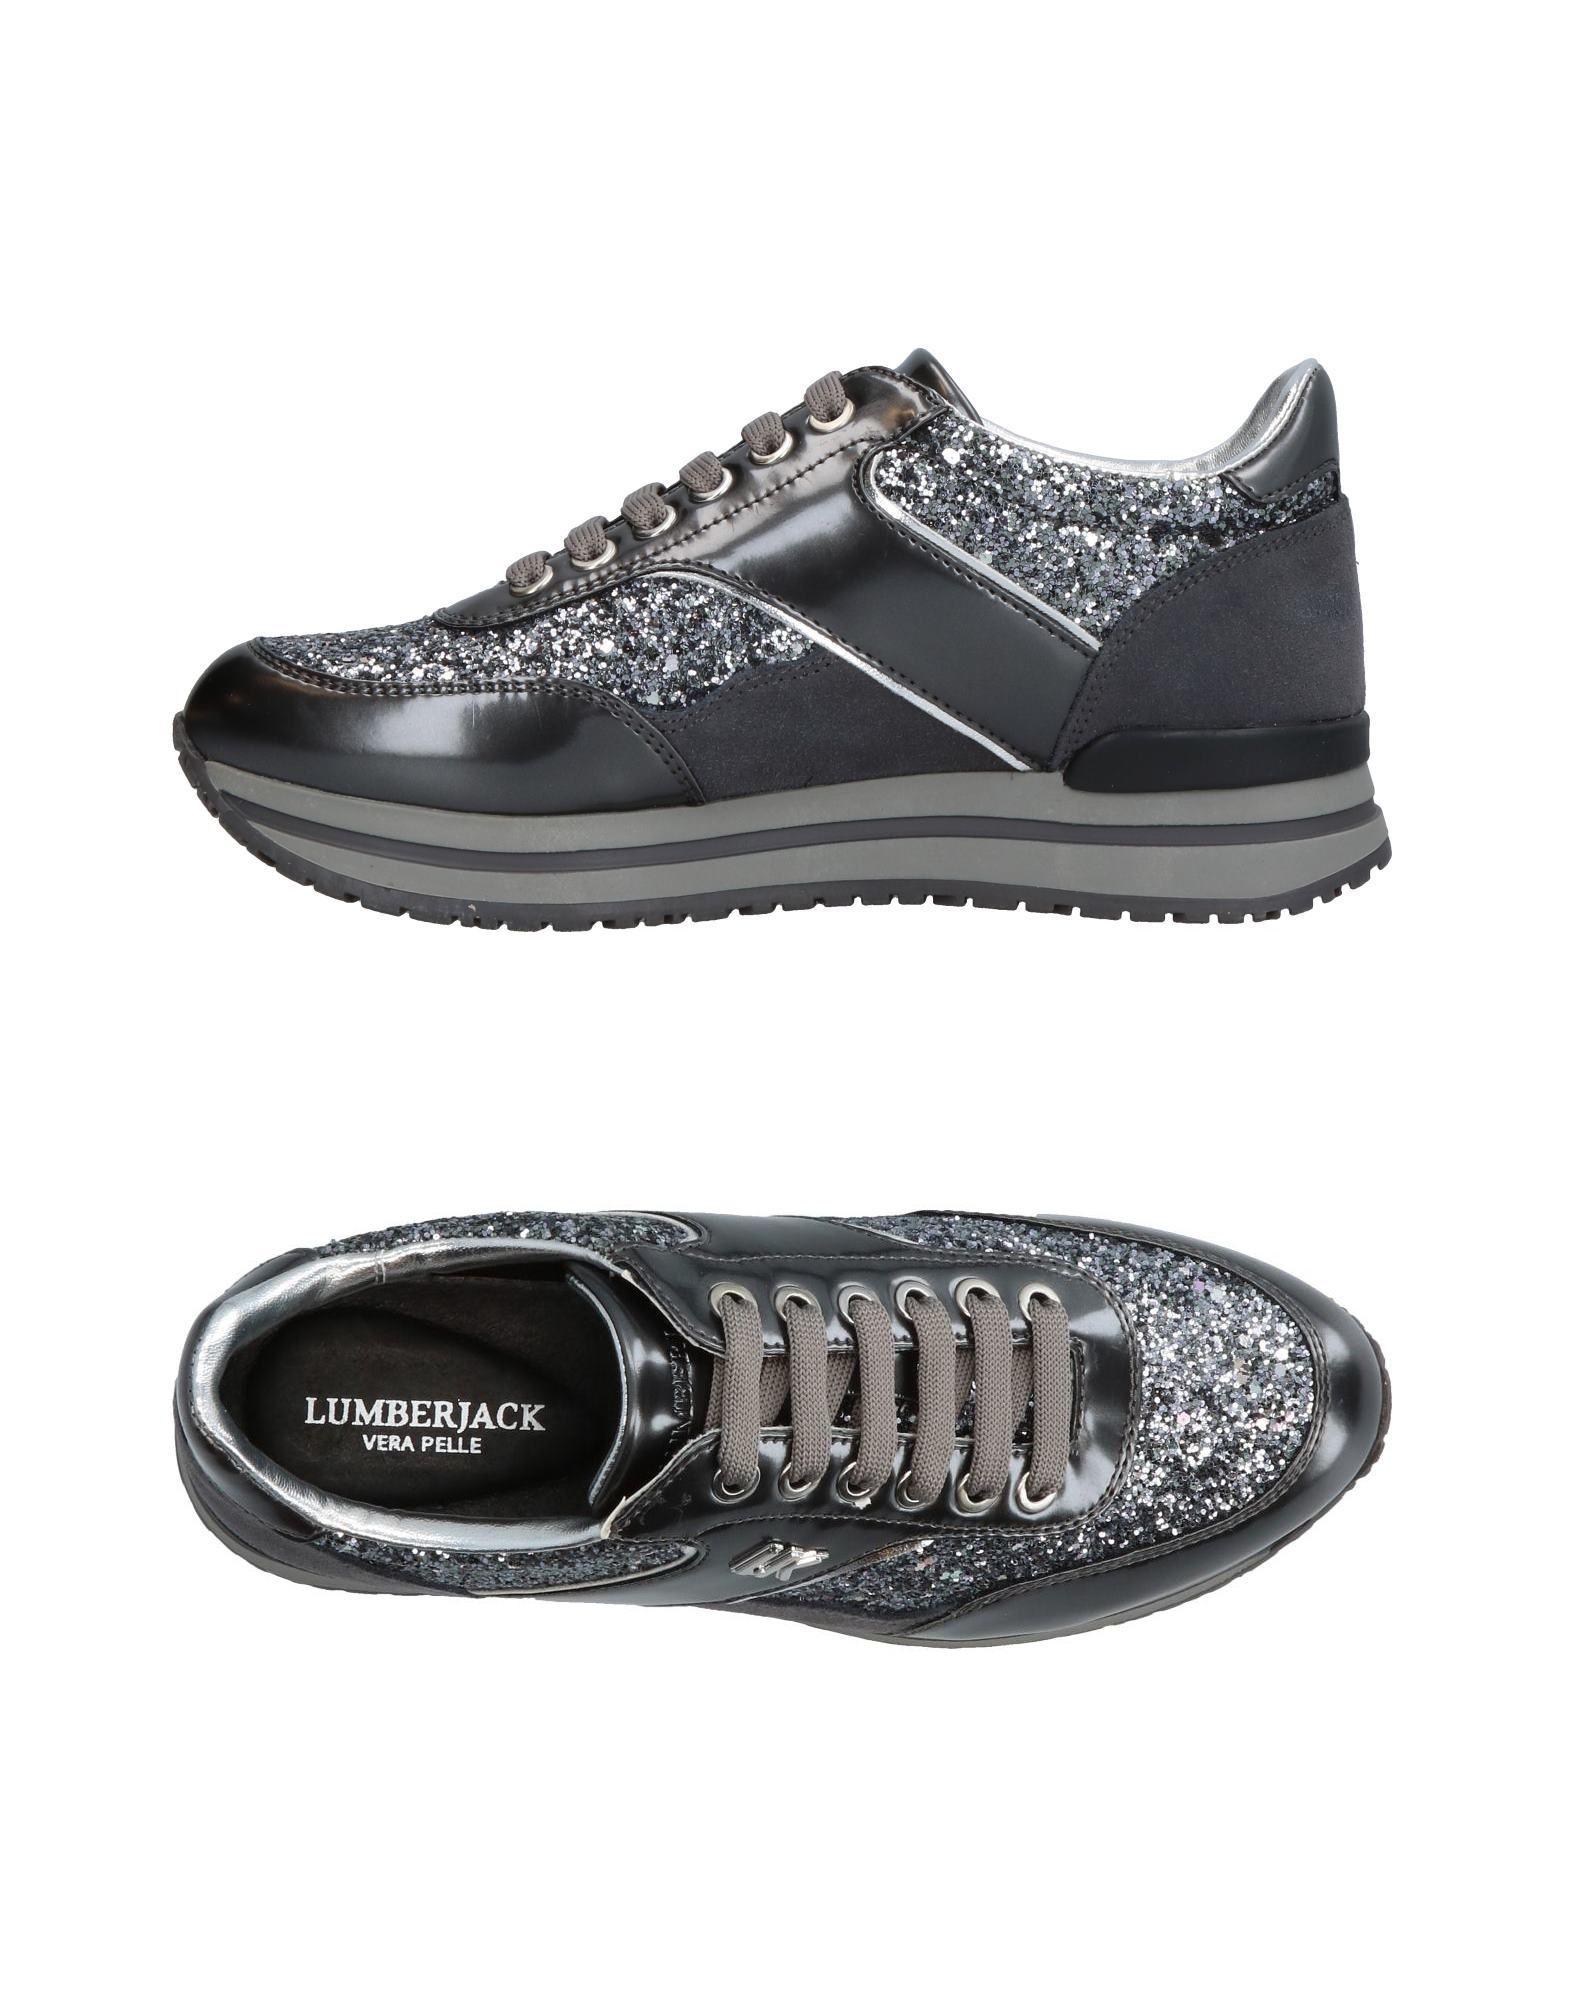 LUMBERJACK Damen Low Sneakers & Tennisschuhe Farbe Blei Größe 9 jetztbilligerkaufen